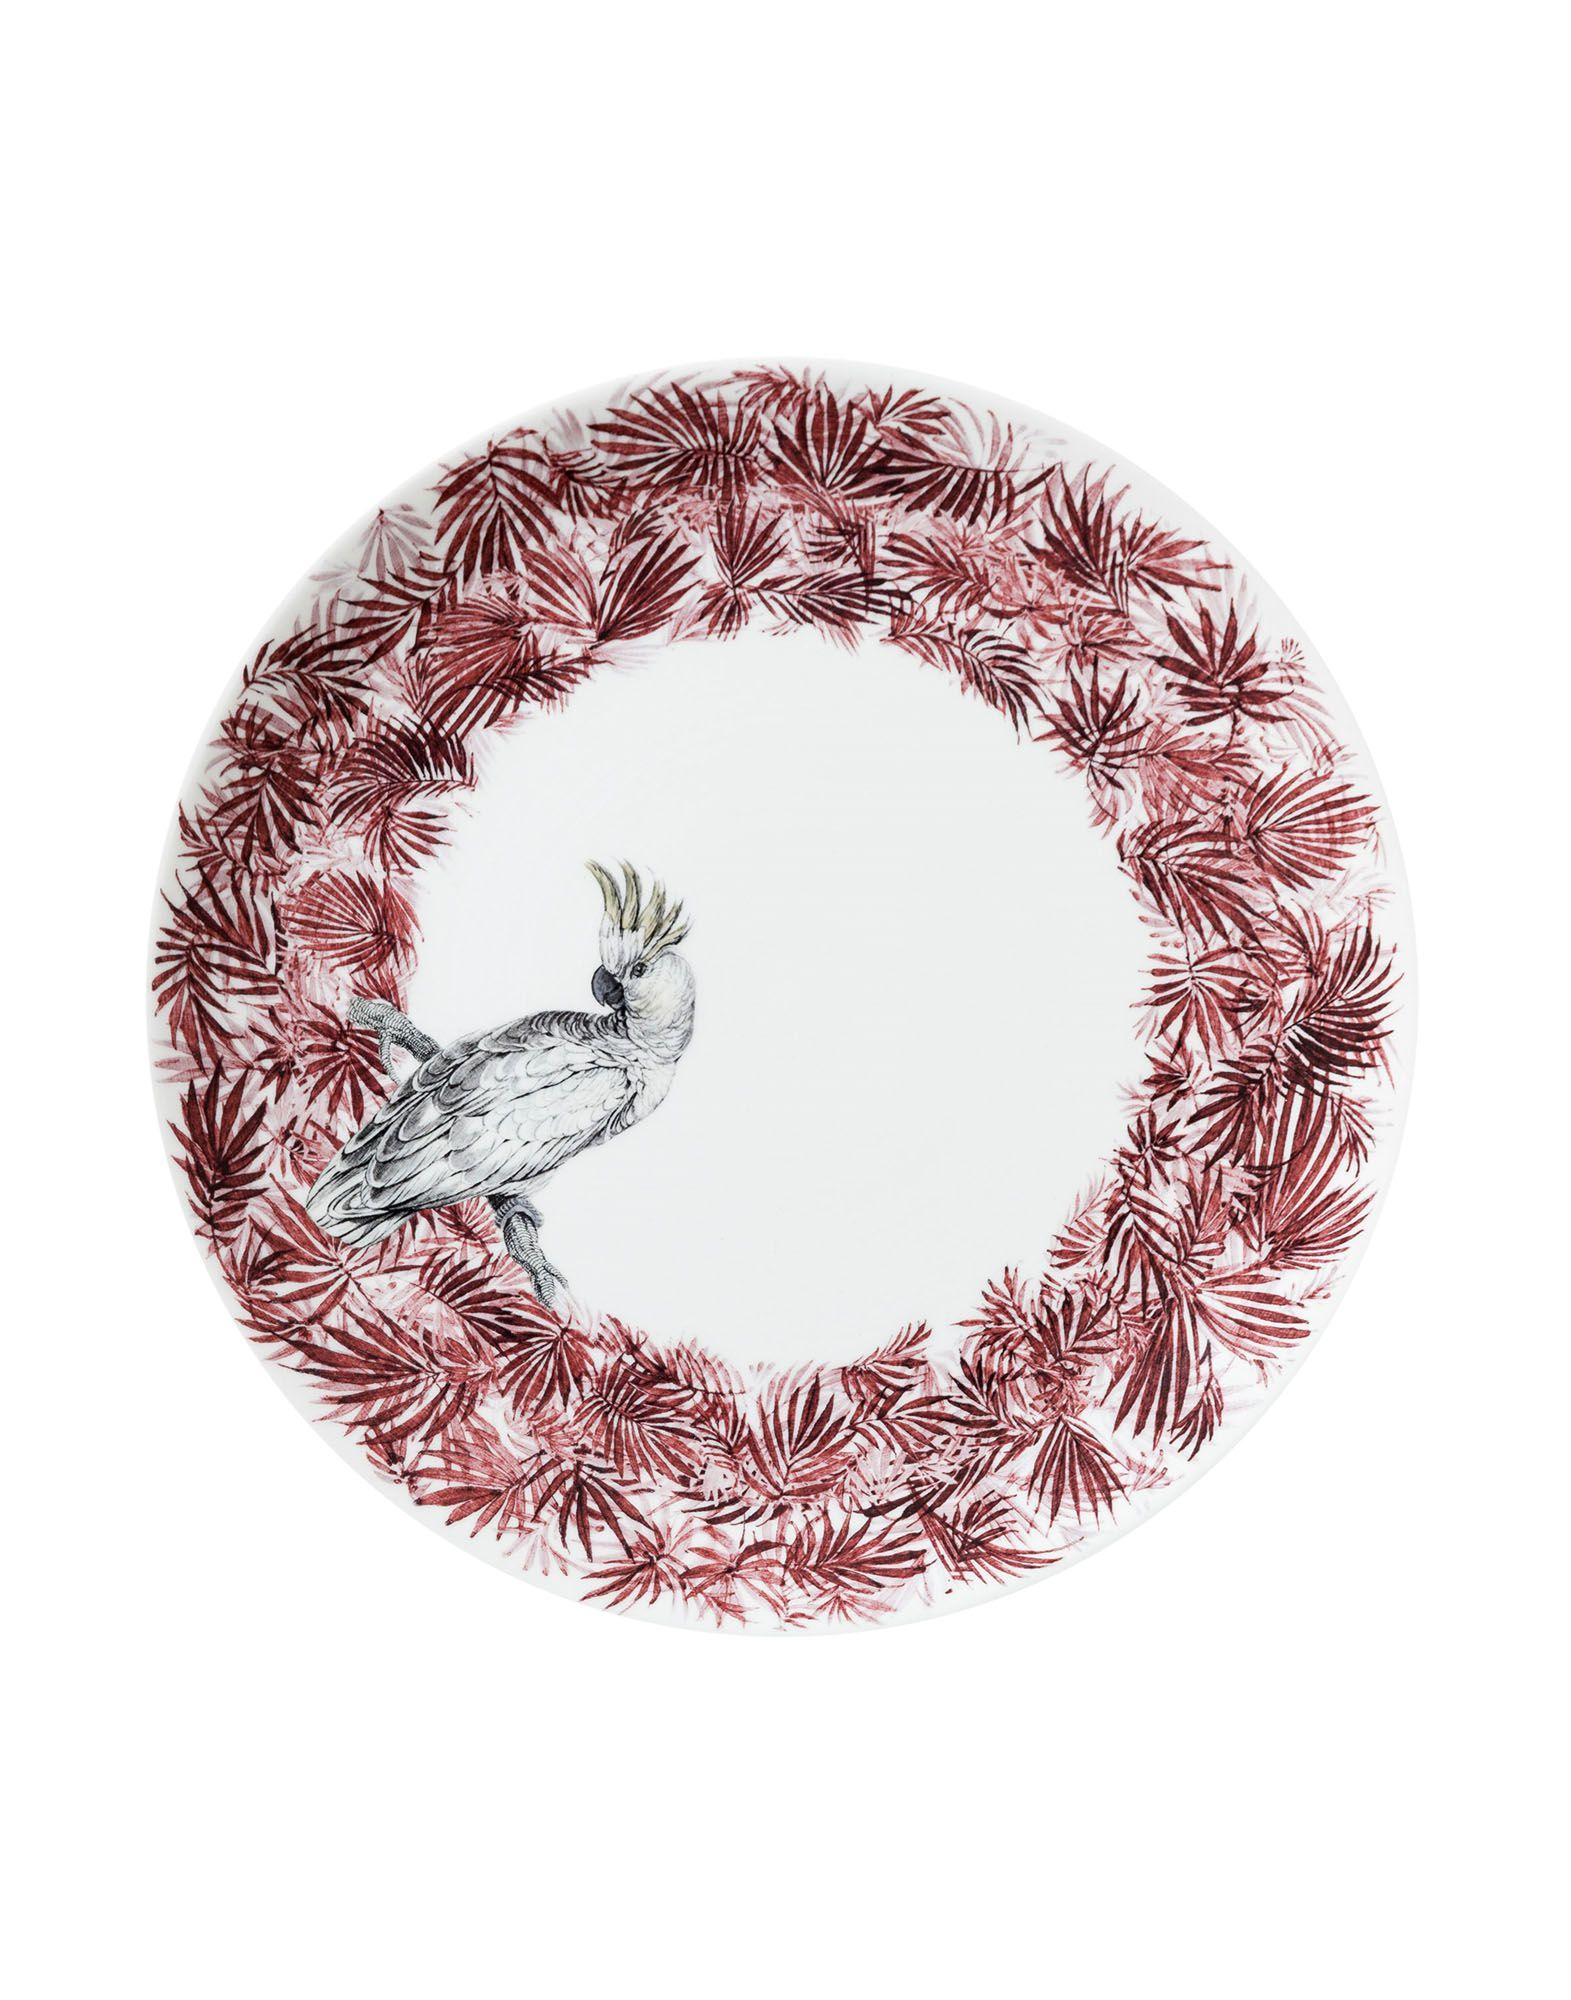 LABORATORIO PARAVICINI Декоративная тарелка homereligion декоративная тарелка нежная роза средняя